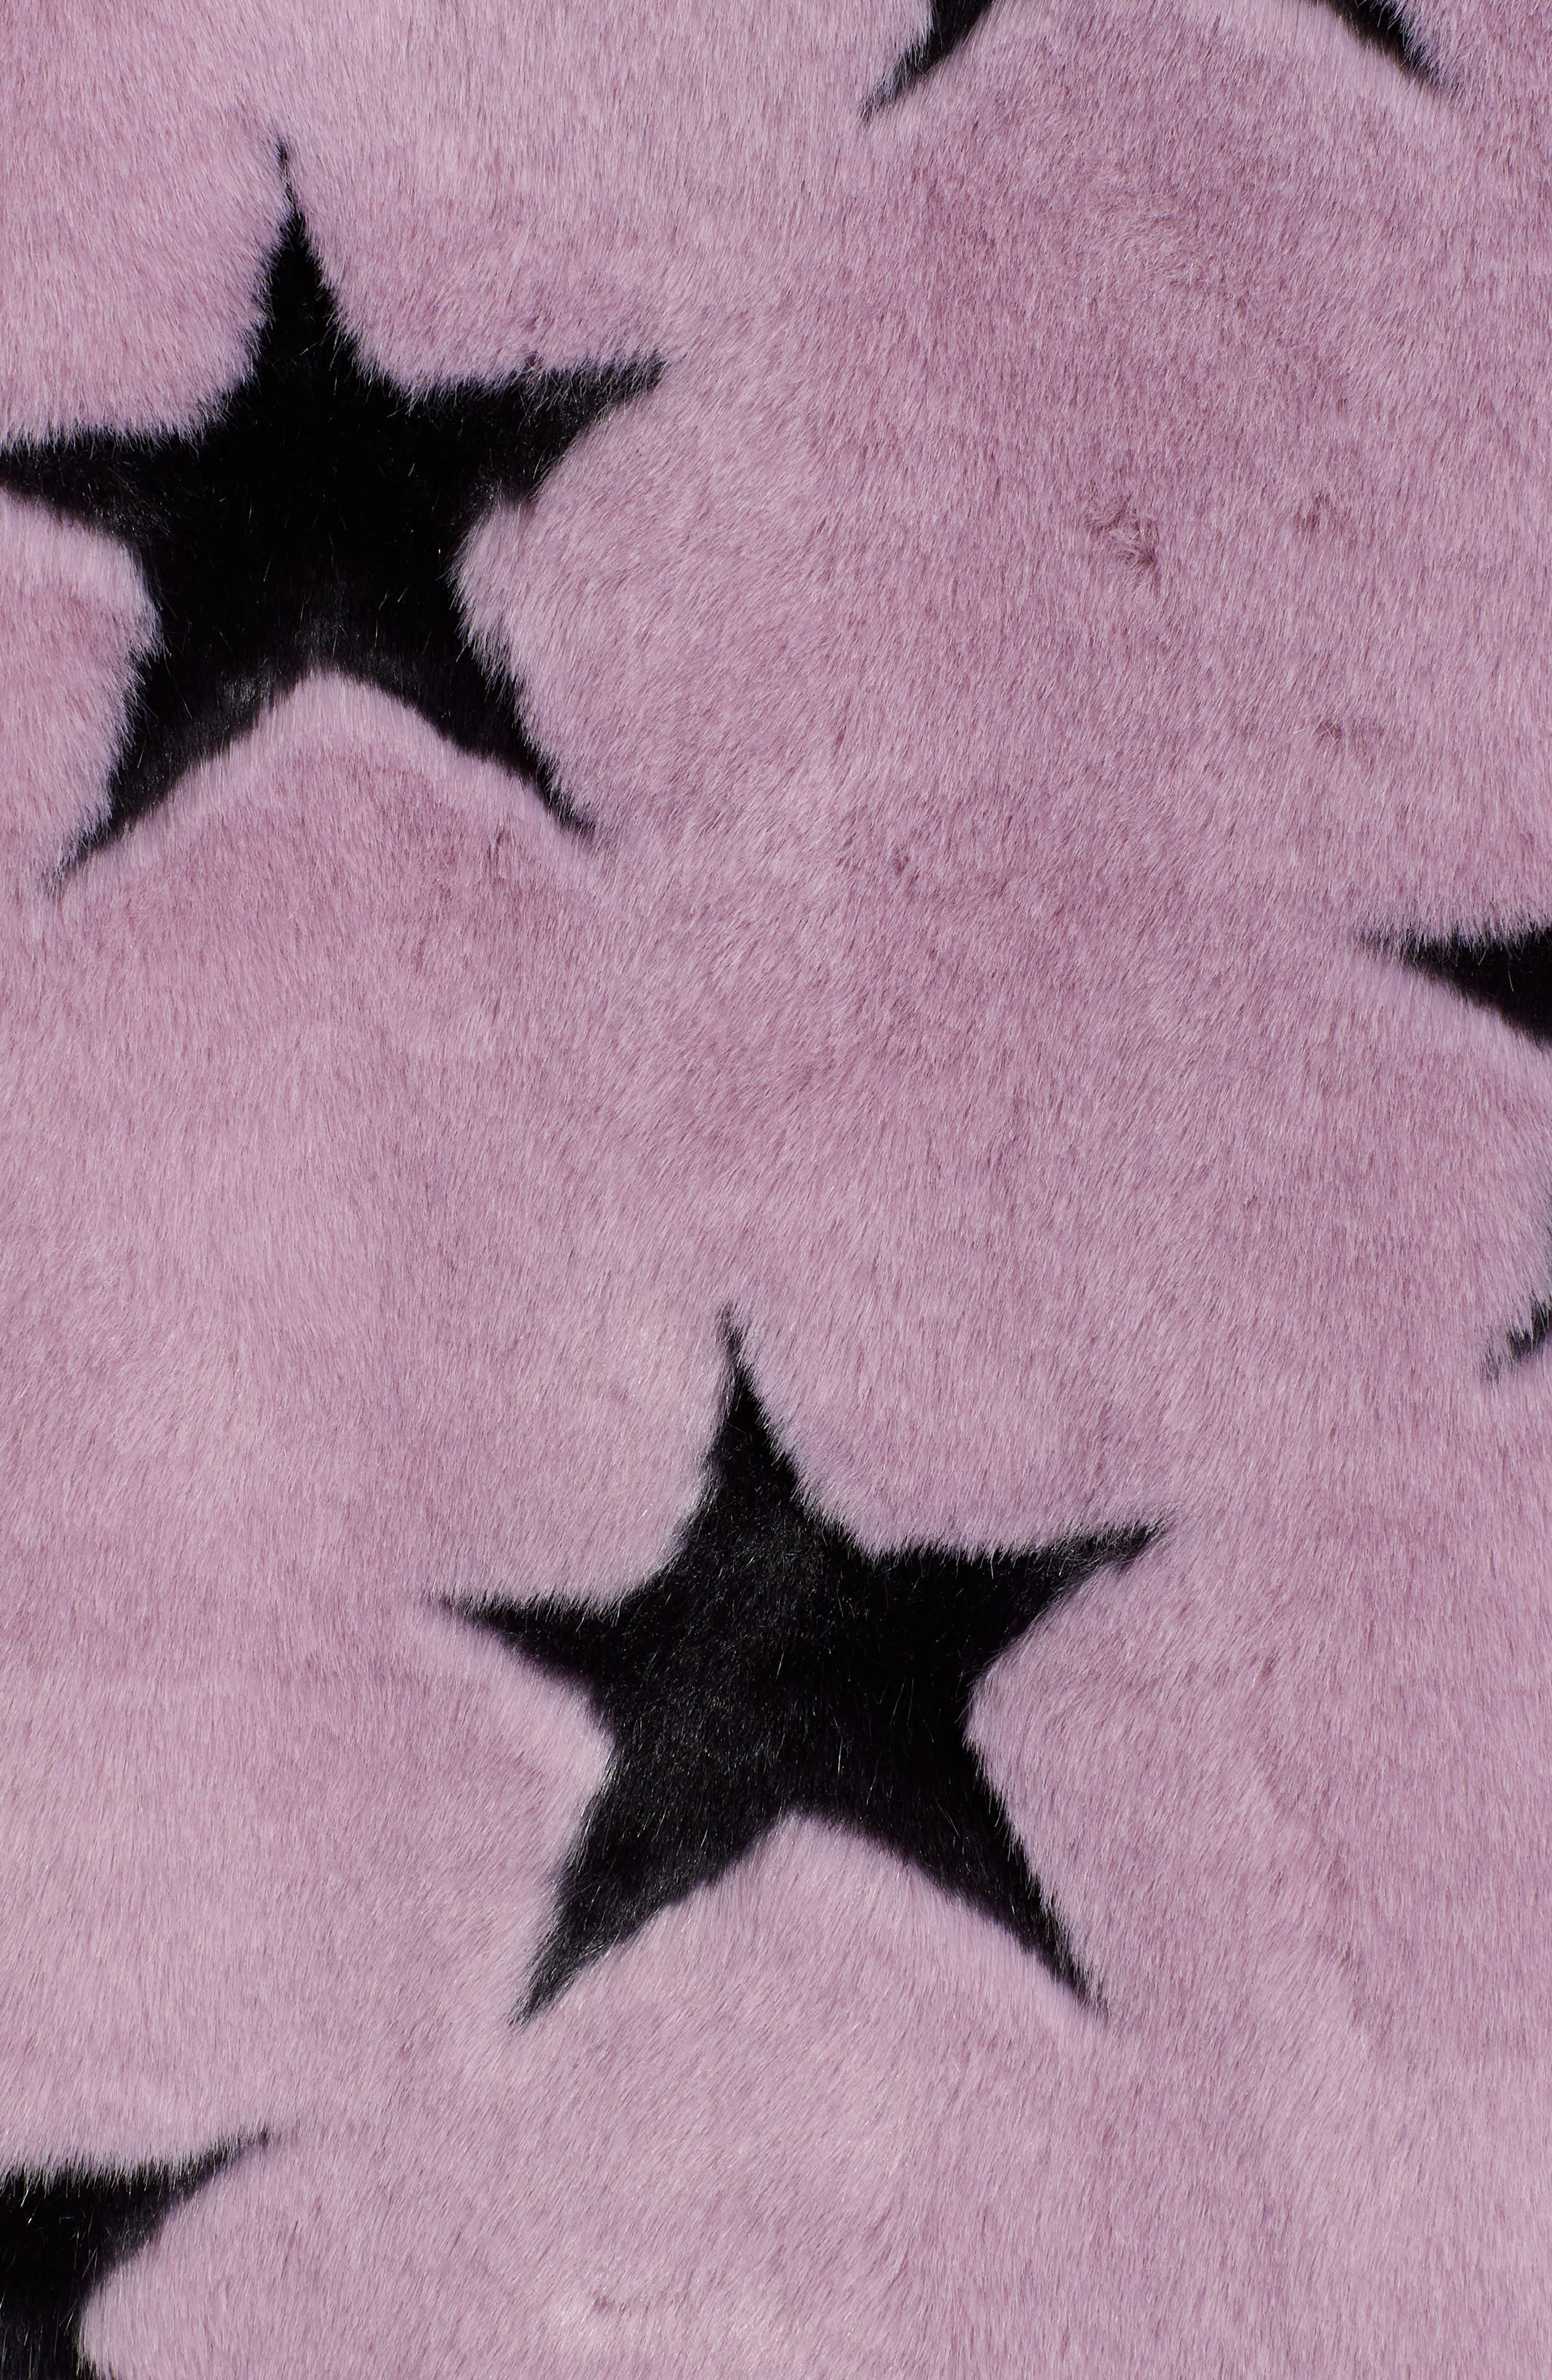 Faux Fur Swing Coat,                             Alternate thumbnail 7, color,                             LAVENDER/ GREYDNU